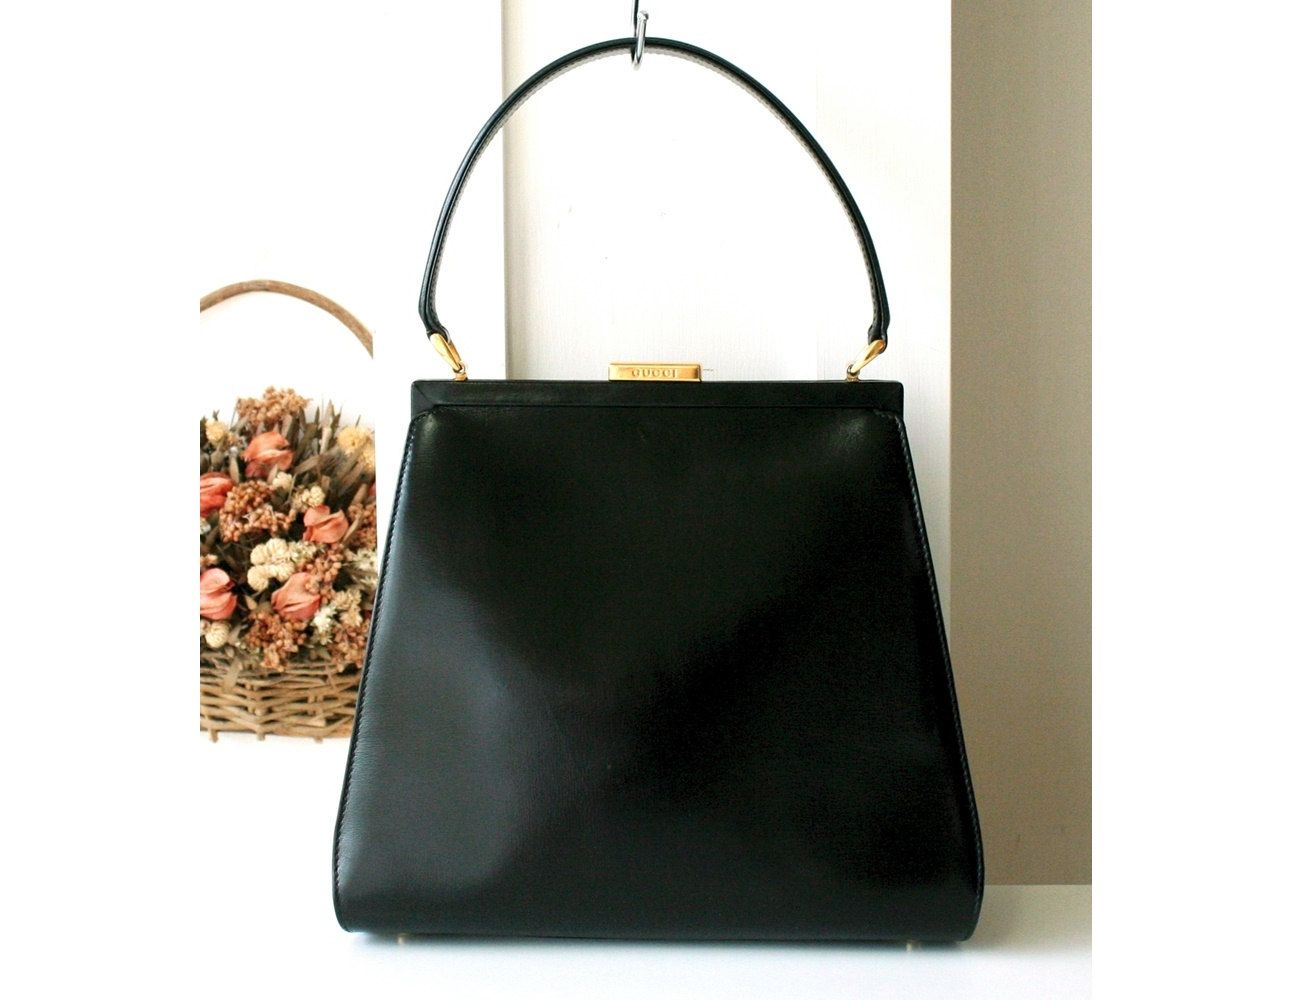 d6fd36bce48 Gucci Kelly bag 80 s Vintage Rare Authentic Black Tote Handbag Purse by  hfvin on Etsy